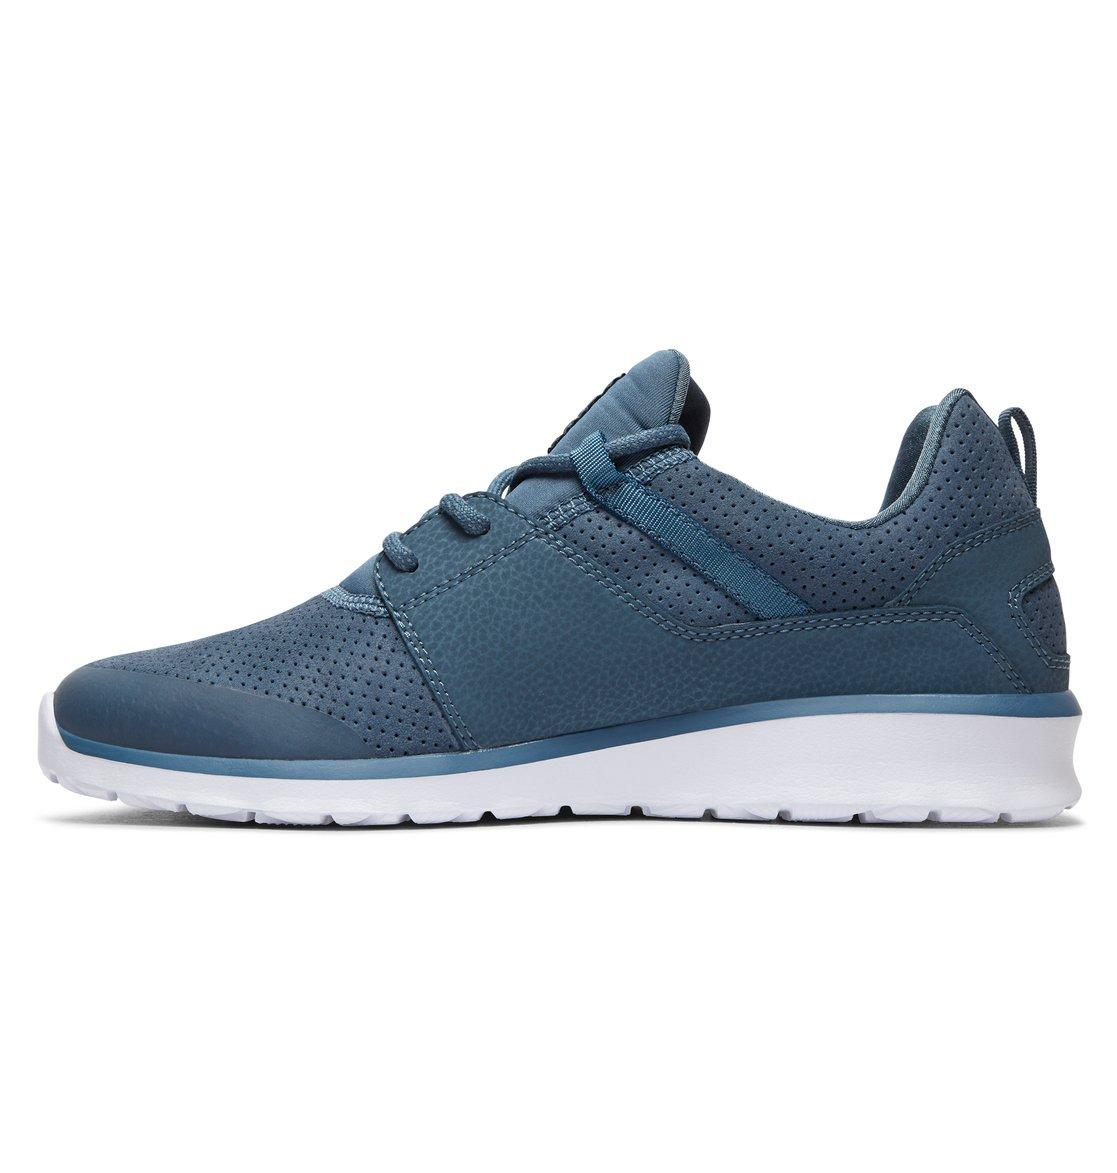 5d00702e15867 2 Tenis Masculino DC Shoes Heathrow Prestige Azul BRADYS700084 DC Shoes